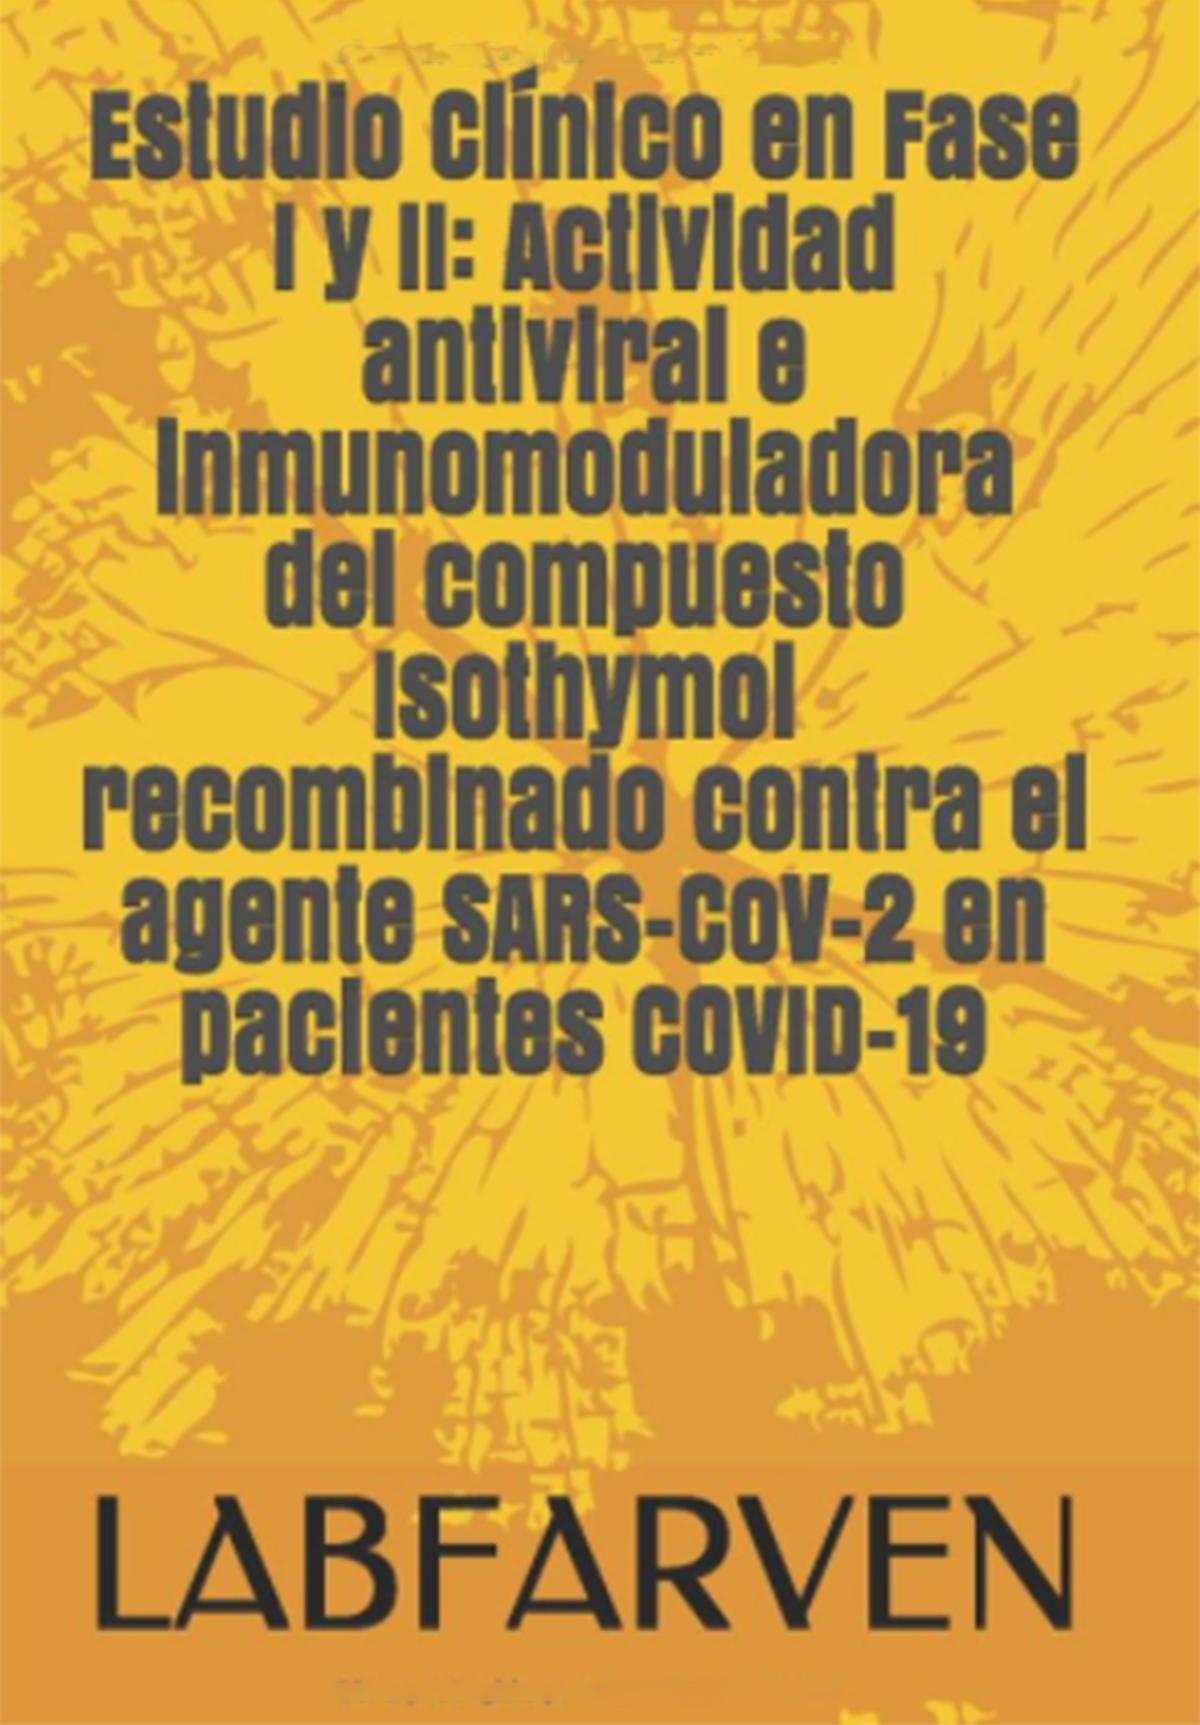 https://cdn.elnacional.com/wp-content/uploads/2021/01/carvativir-3.jpg